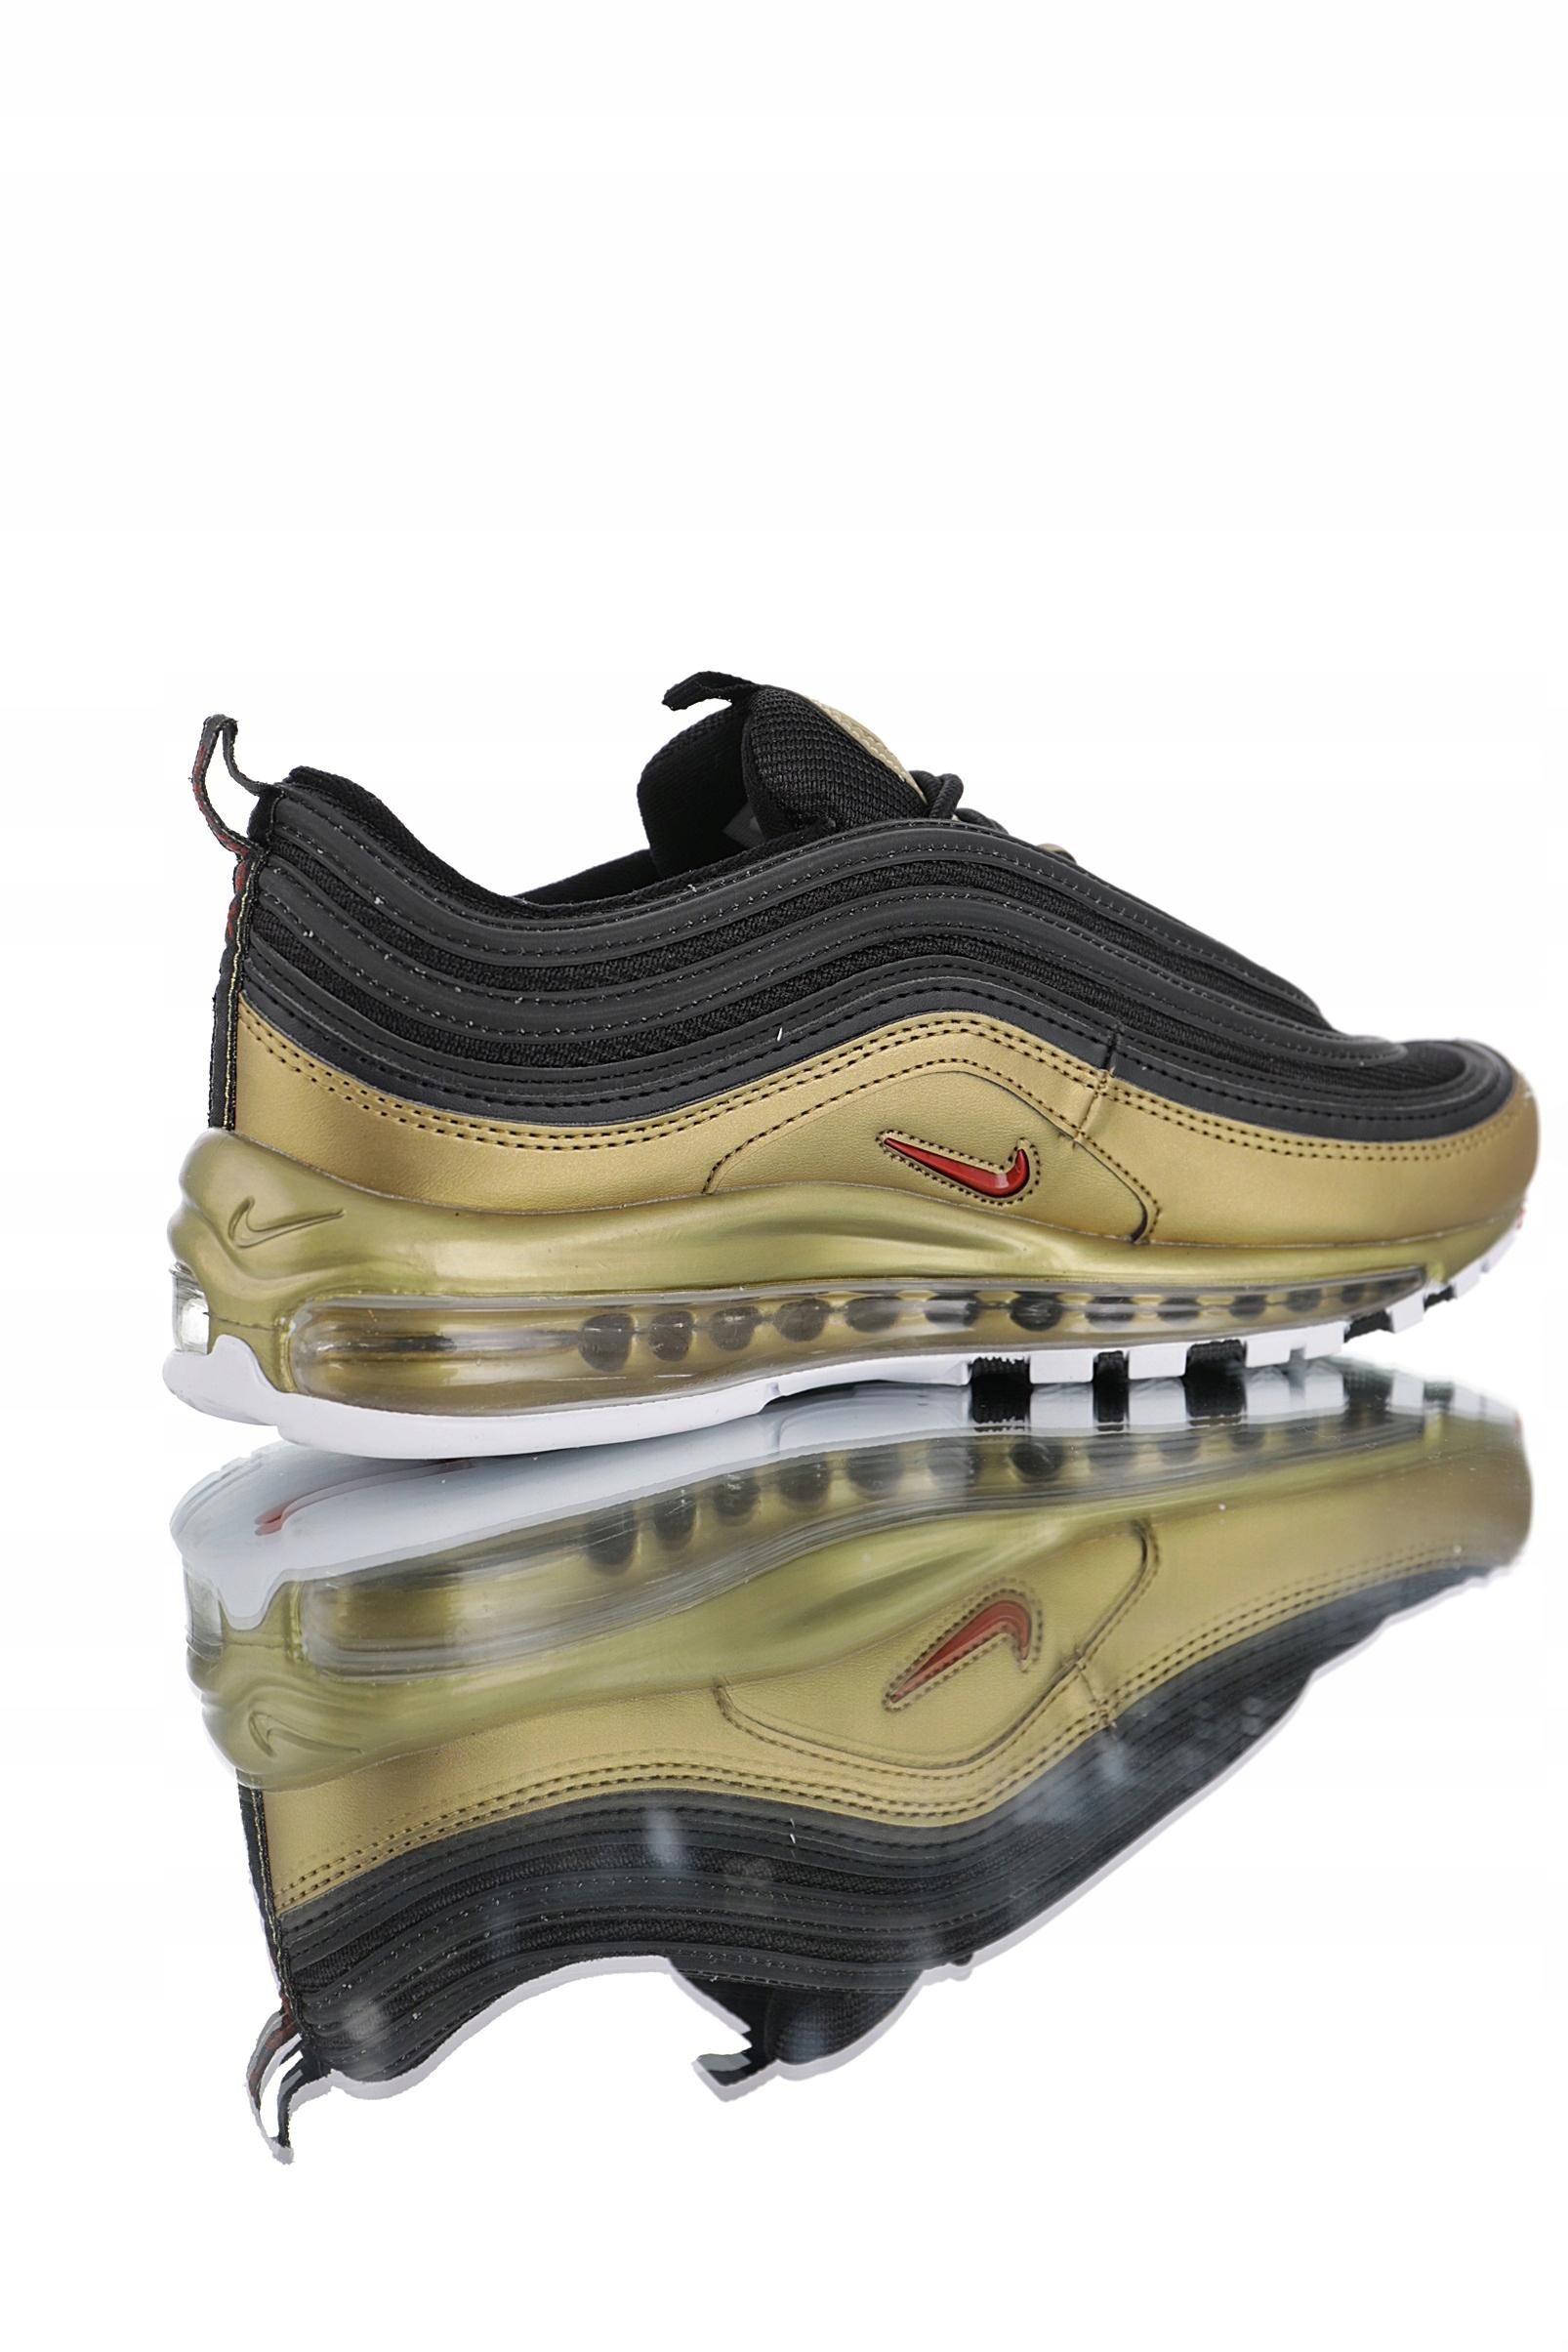 Nike Air Max 97 QS AT5458 002 nr 38 7813601097 oficjalne